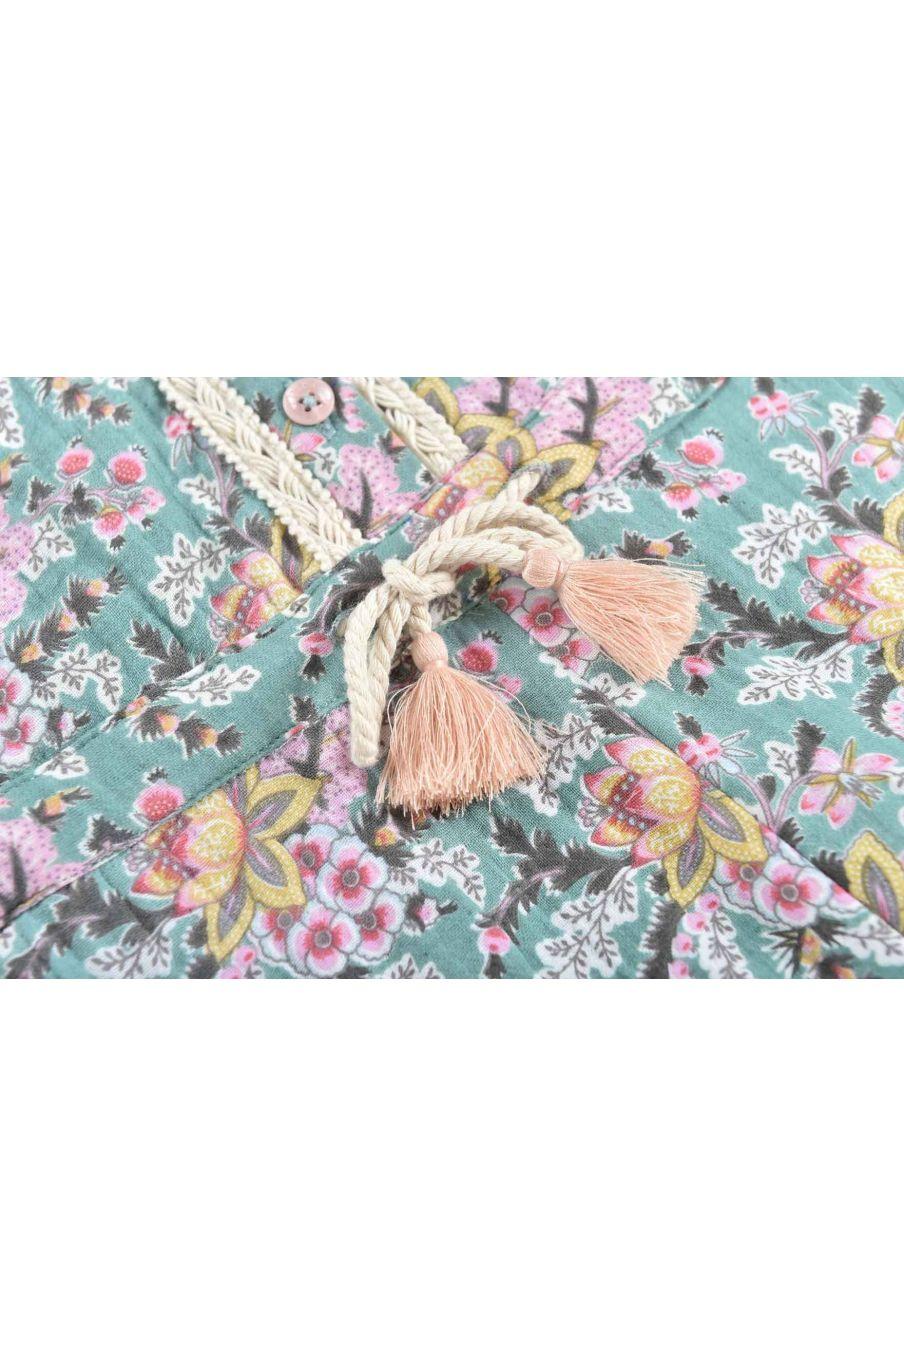 combinaison fille jenna blue french flowers - louise misha